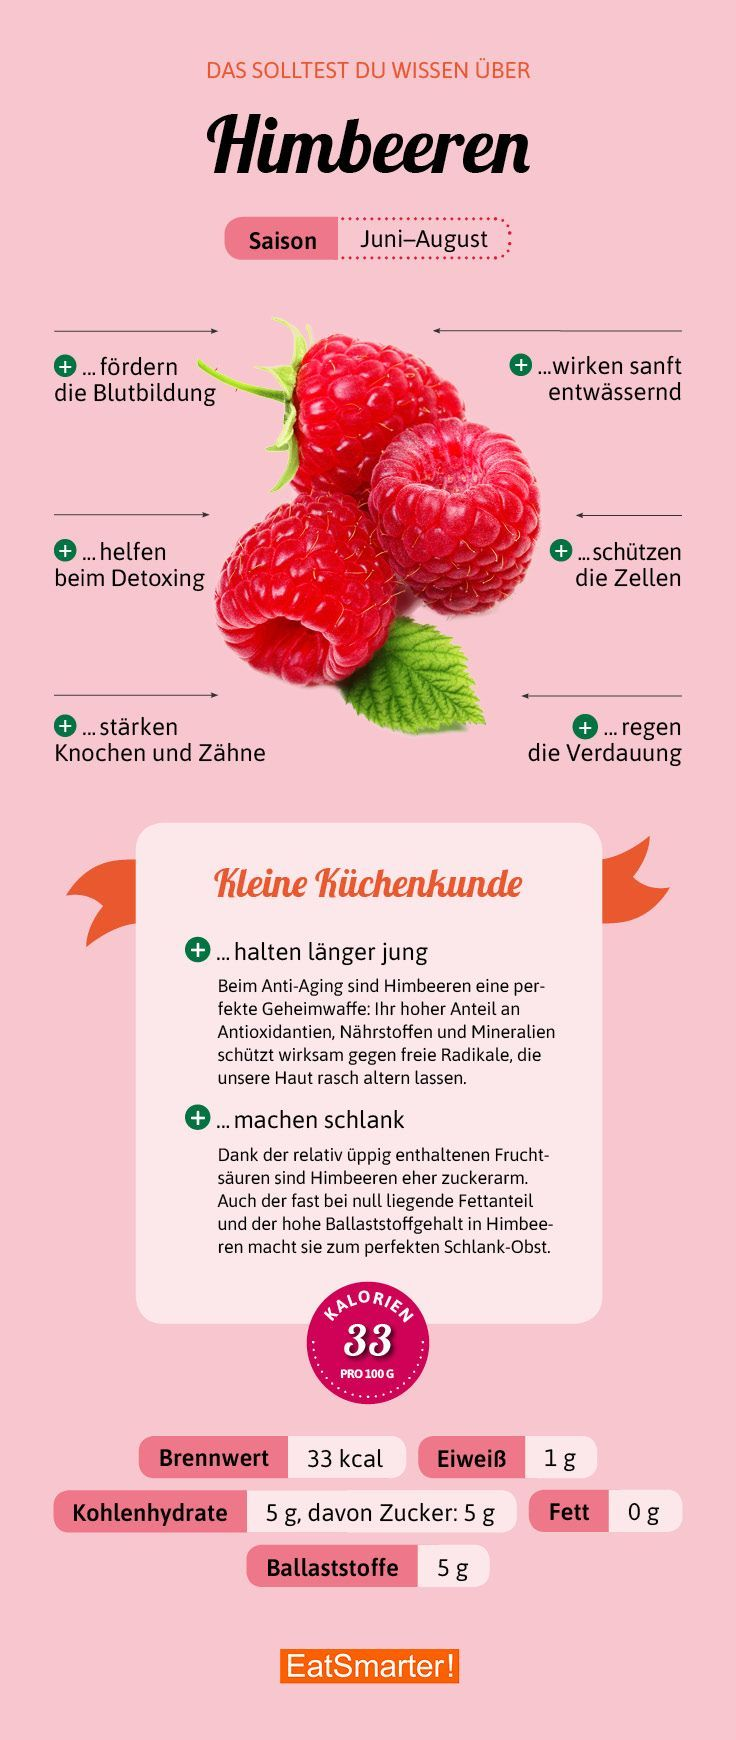 Photo of raspberries